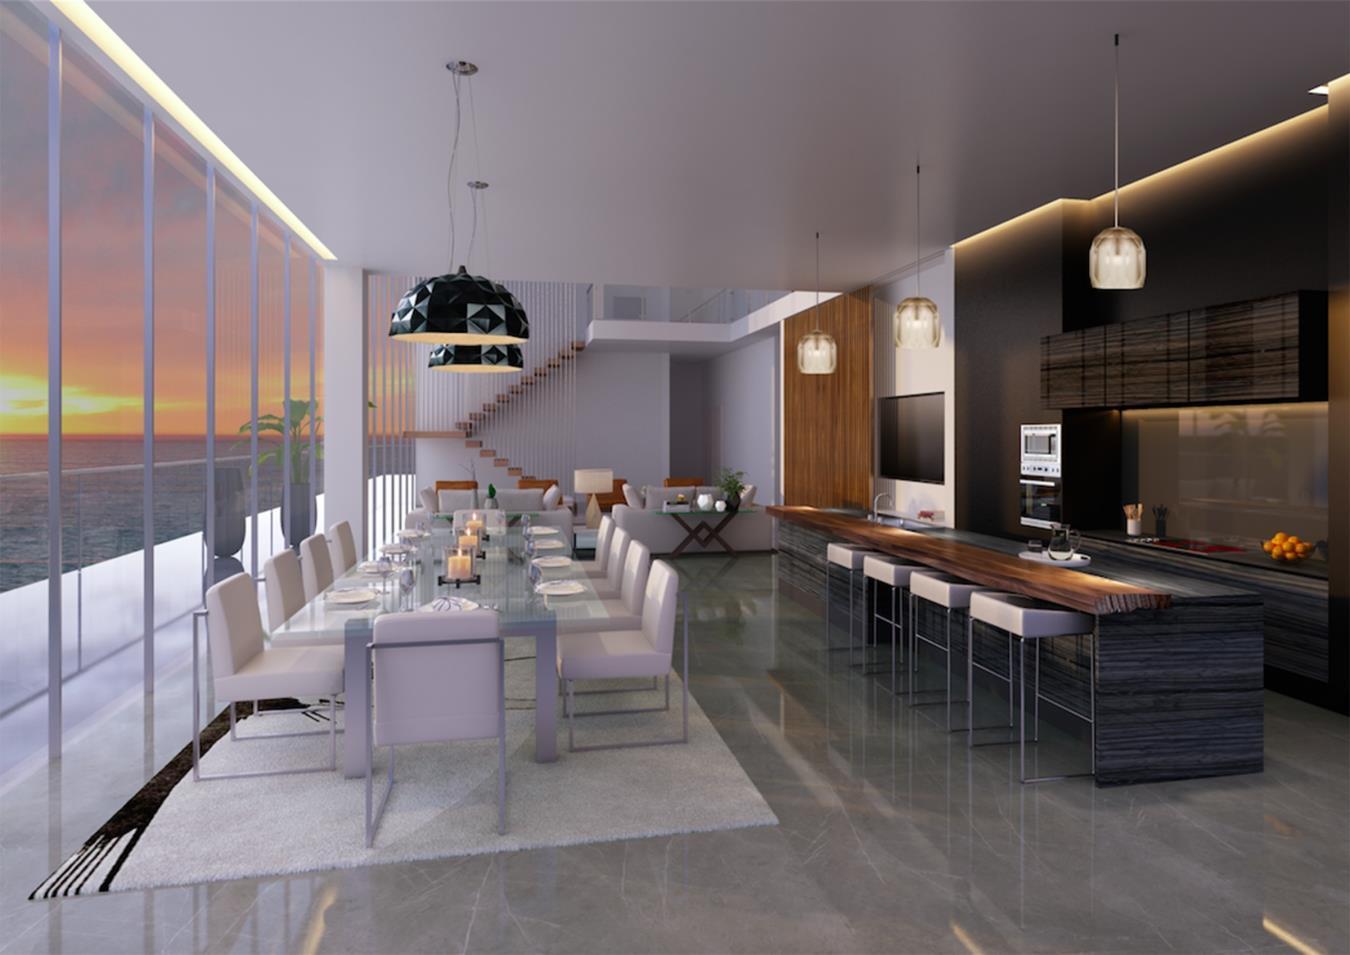 1/JBR Luxury Beachfront Living with Dubai Eye View